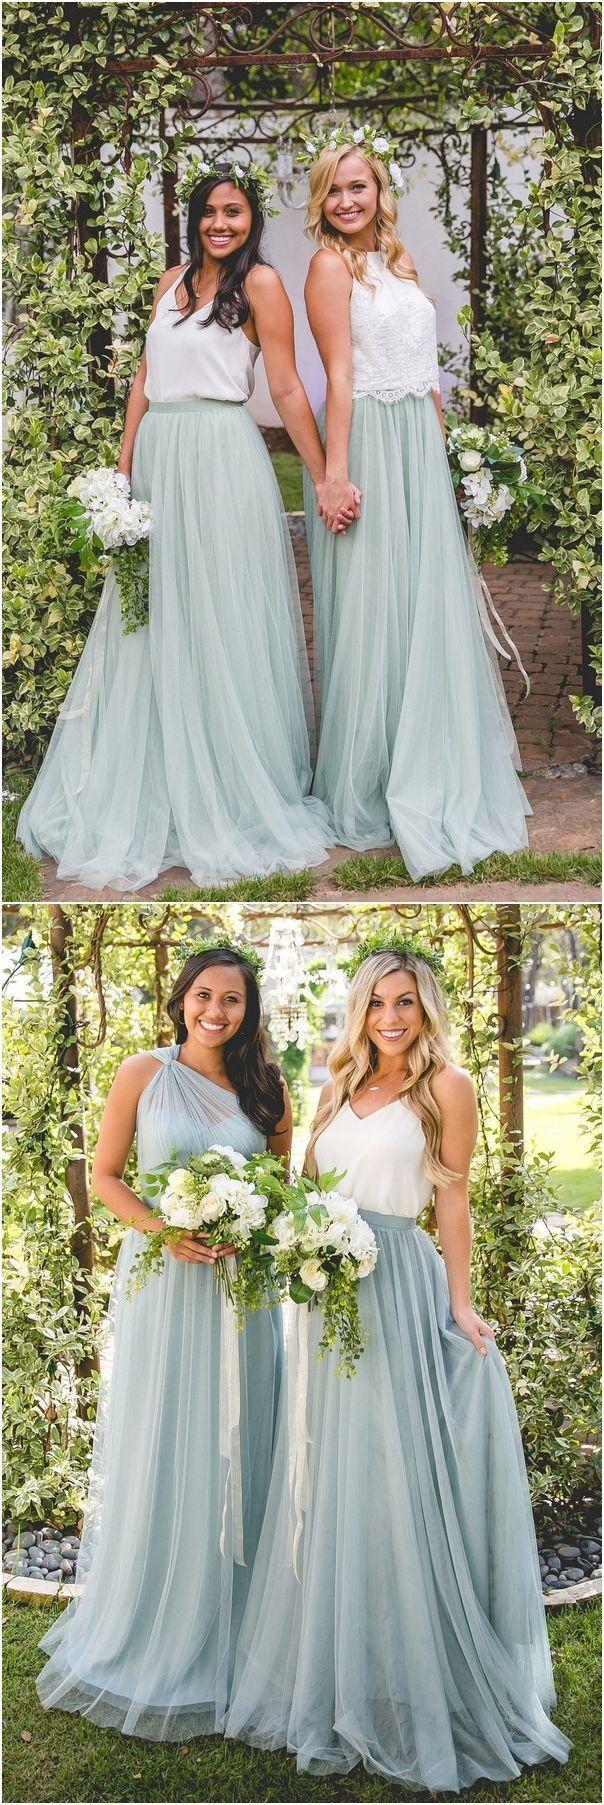 Skylar Tulle Skirt | Wedding, Weddings and Wedding dress